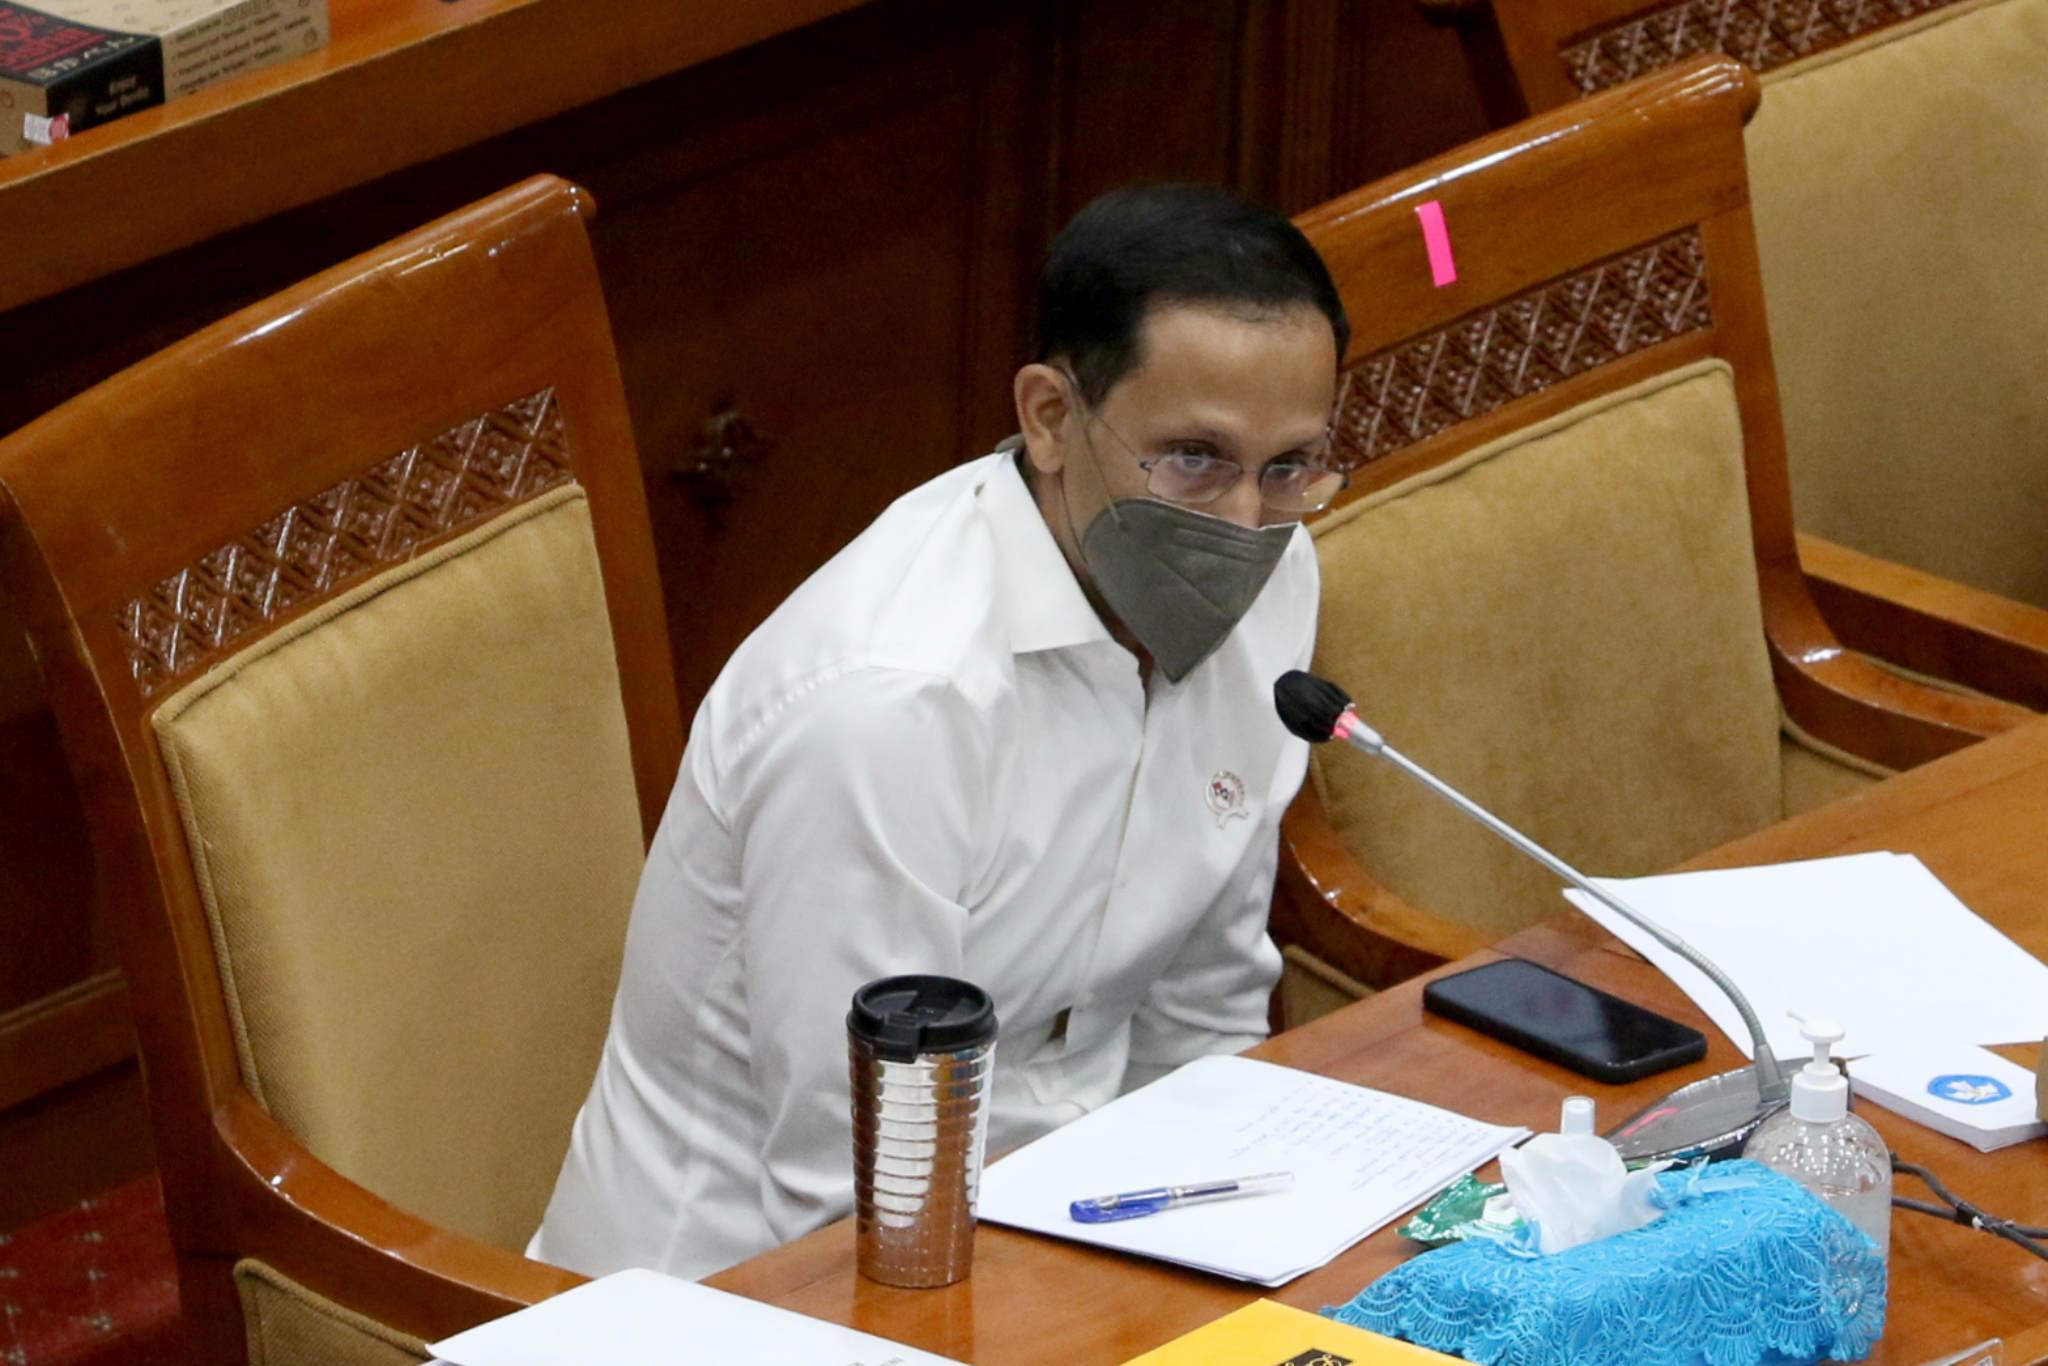 Dengar Keberatan DPR, Menteri Nadiem Akan Kaji Ulang Soal Pajak Pendidikan